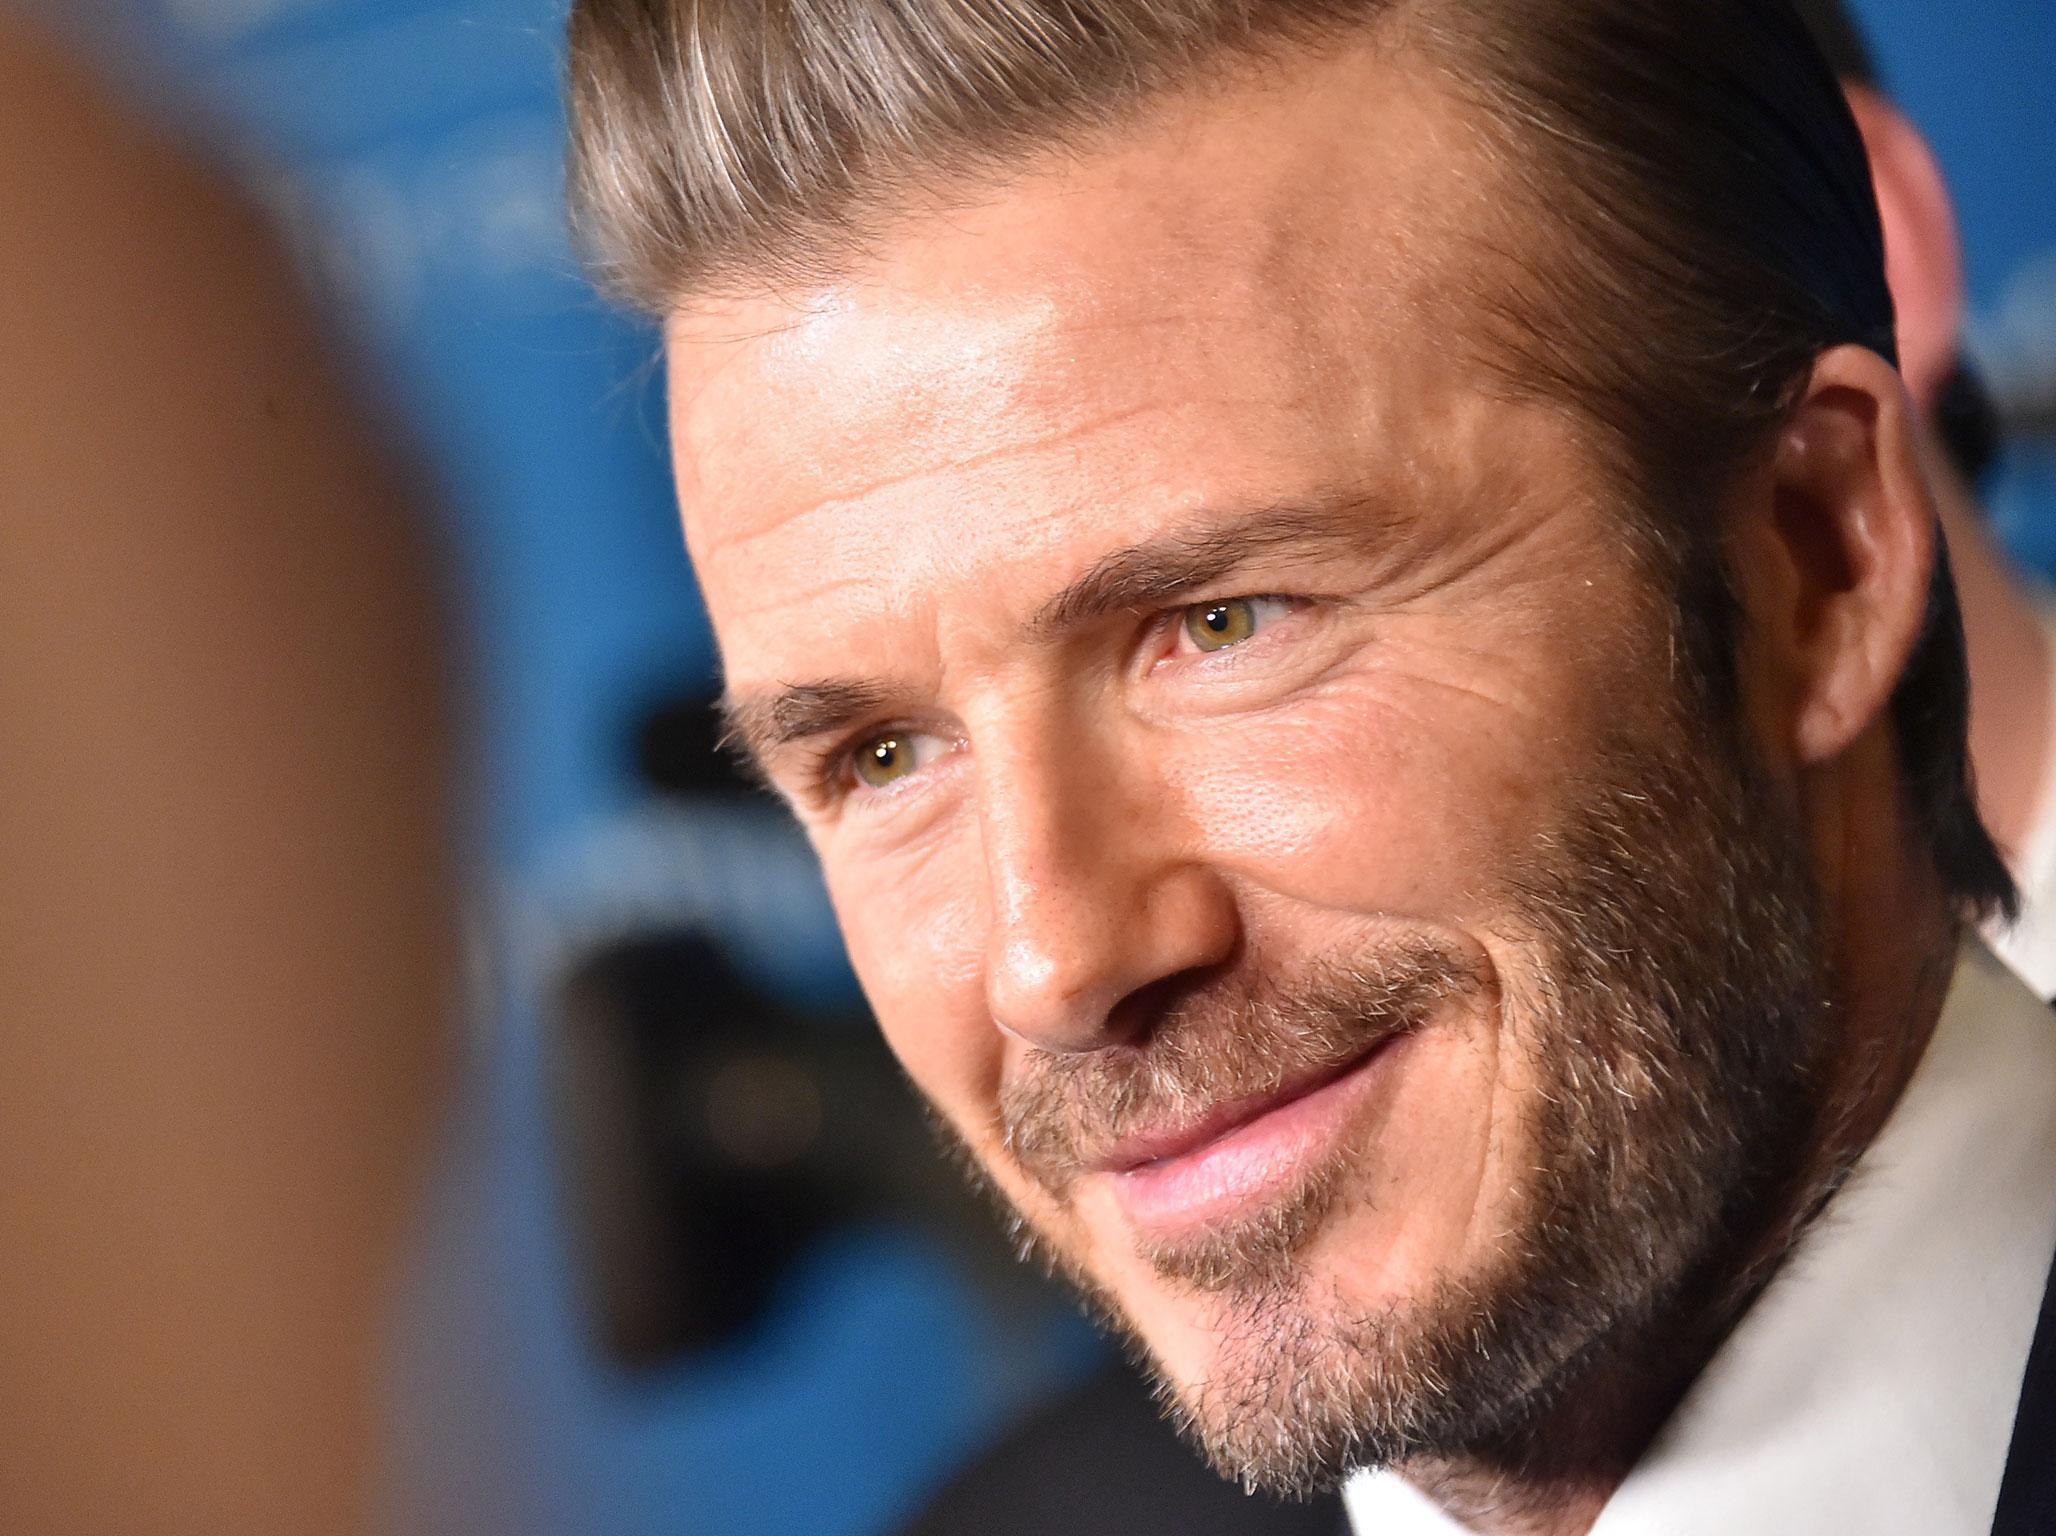 David Beckham was like Michael Jordan for MLS his Miami team can